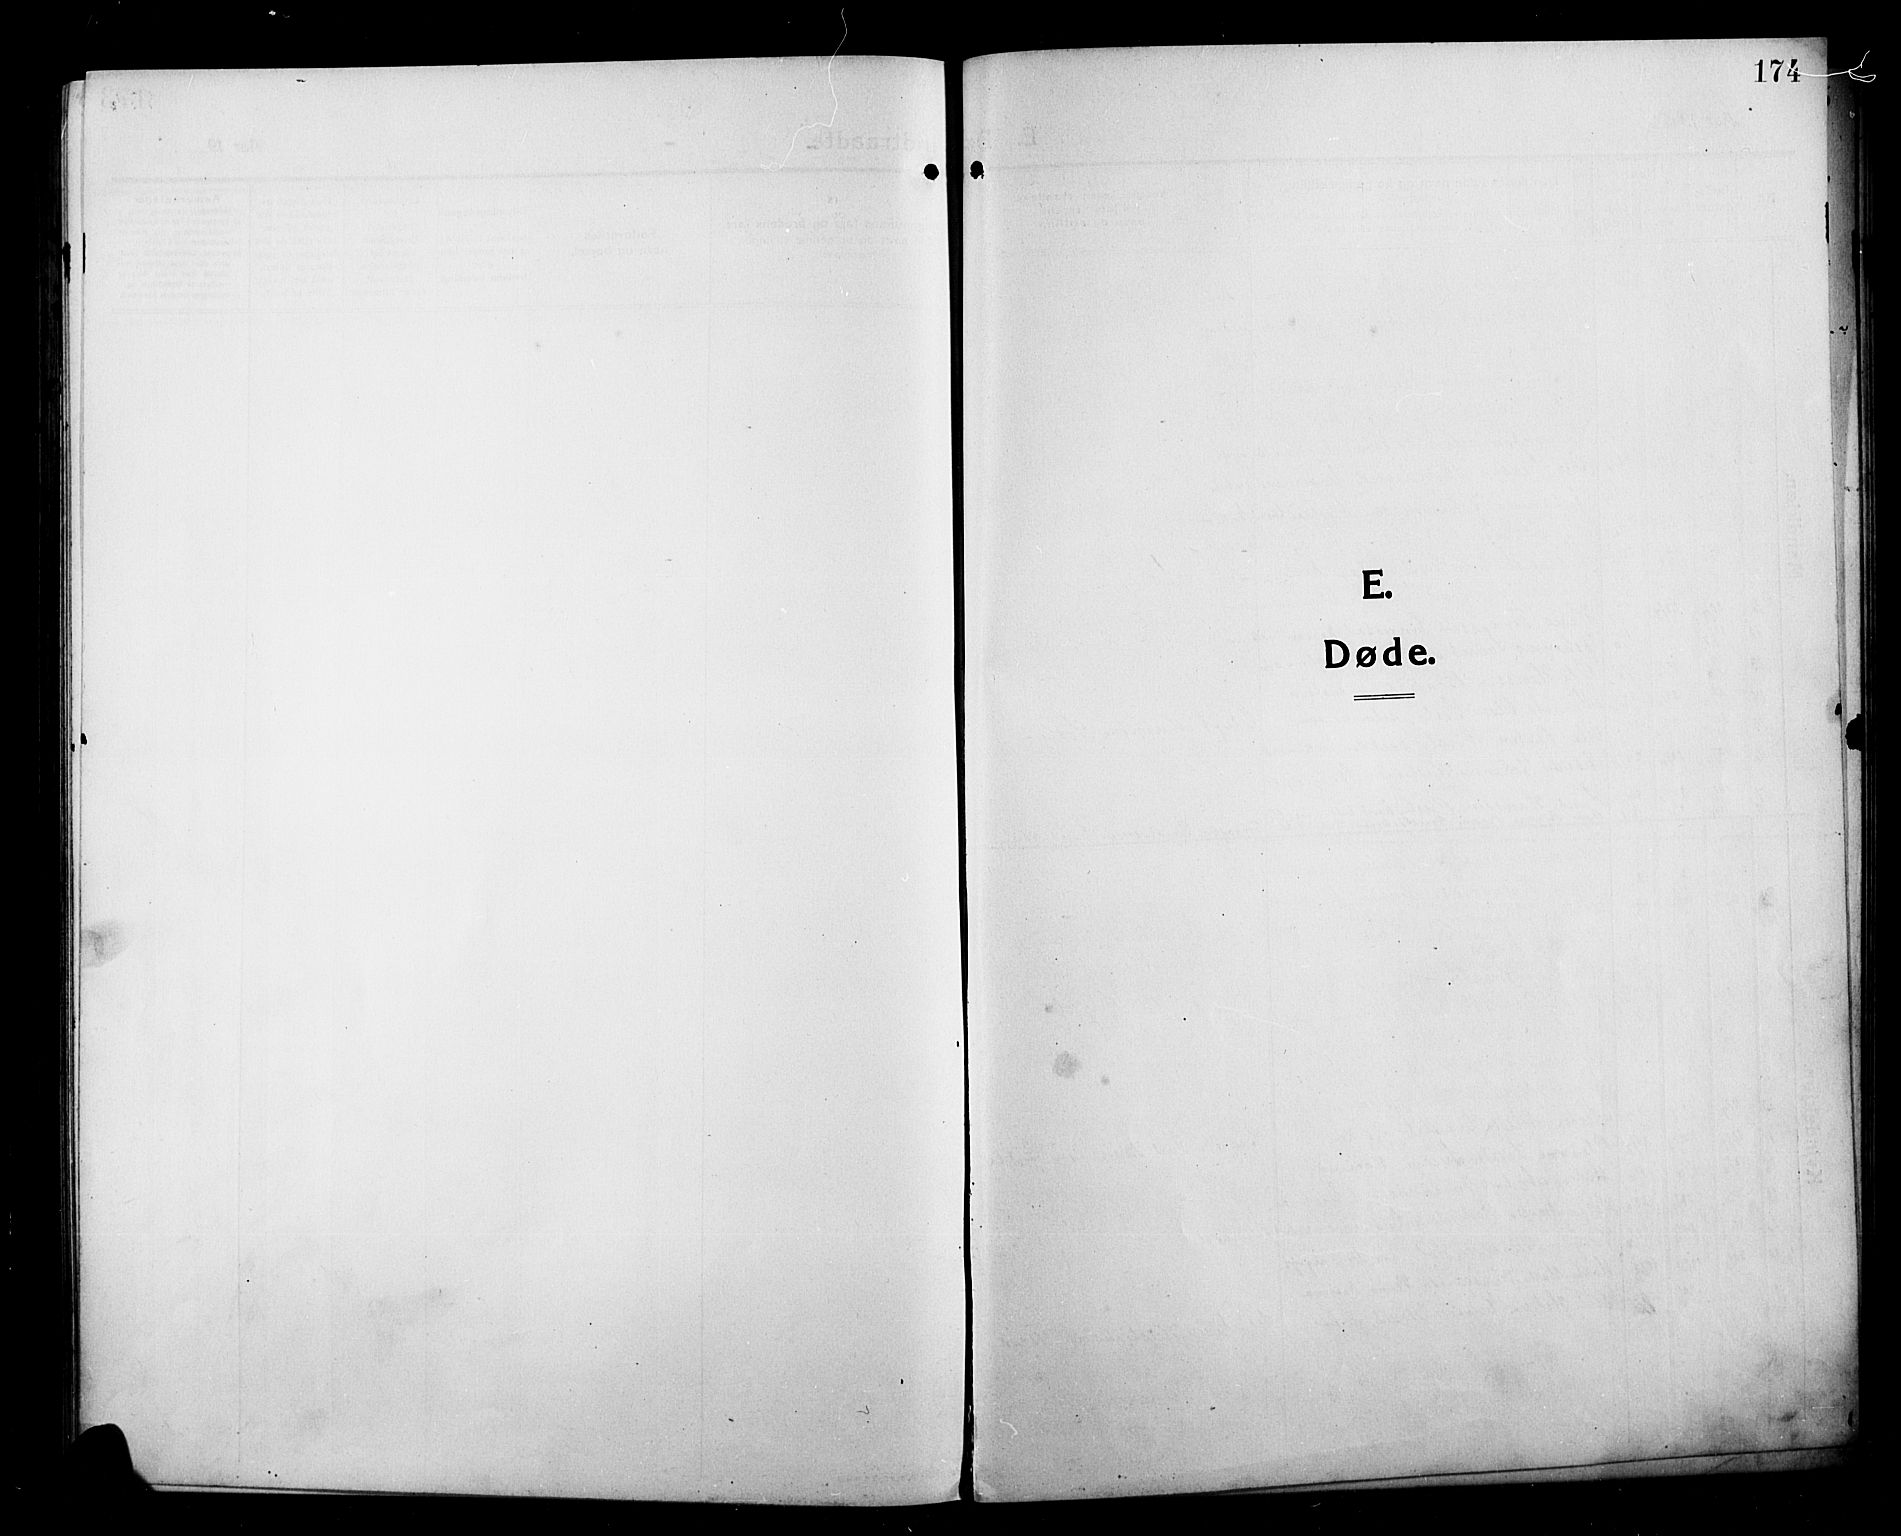 SAH, Kolbu prestekontor, Klokkerbok nr. 1, 1912-1925, s. 174